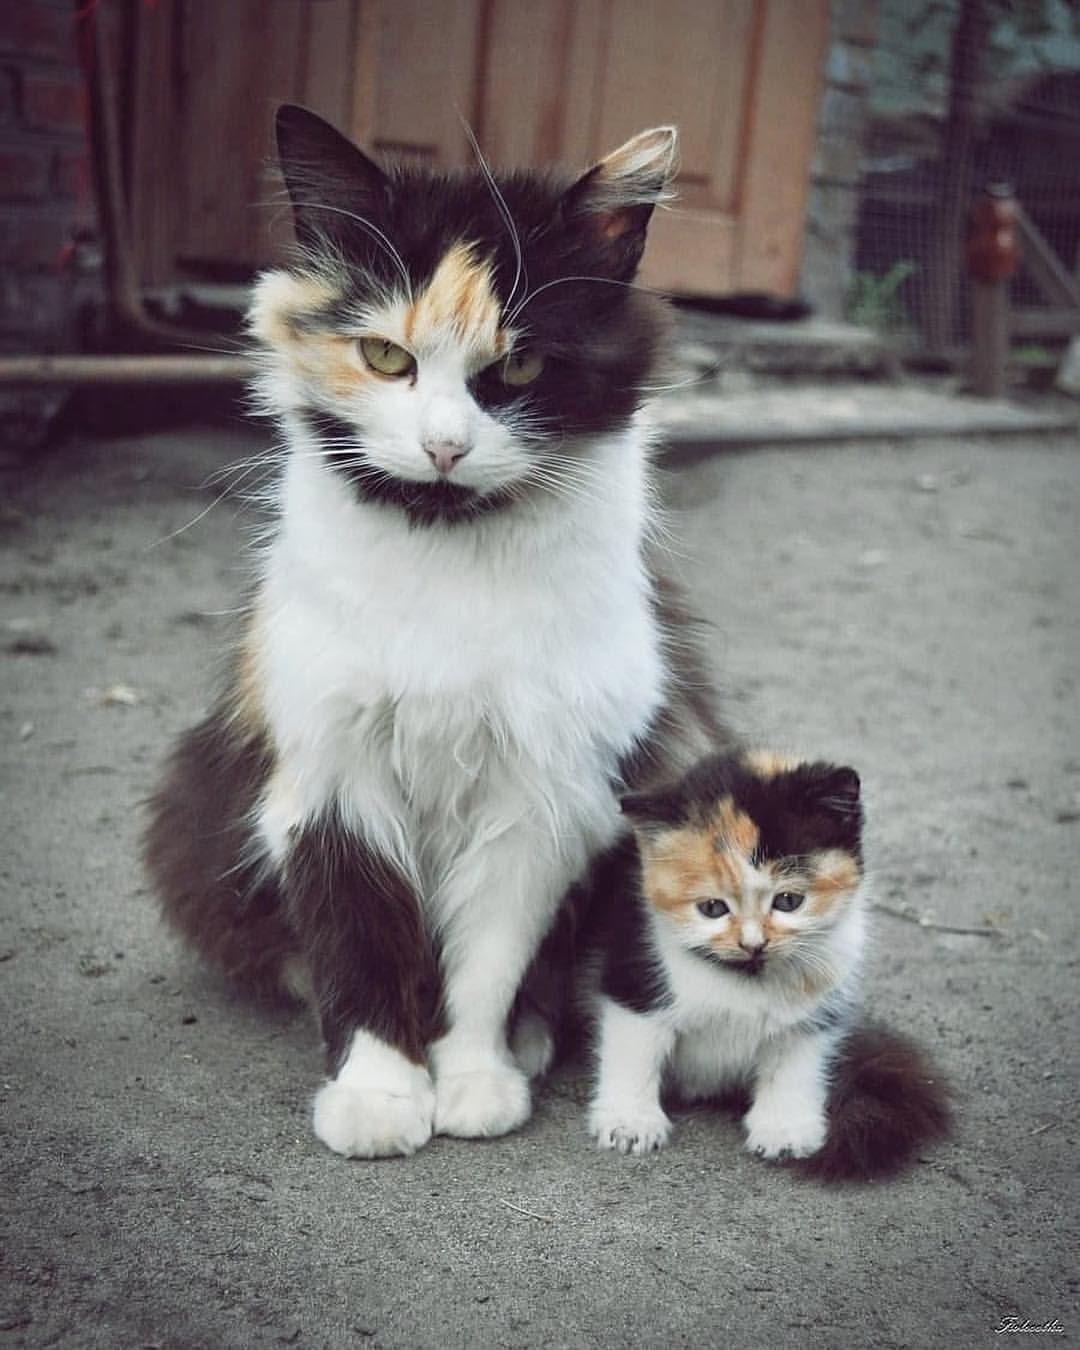 Cat Ideas Diy Cat Care Tips Best Cat Litter Cat Supplies List Cat Stuff Cat Tshirt Cat Ideas Diy Cat Things Cat How Gatos Bonitos Fotos De Gatitos Bebes Gatos